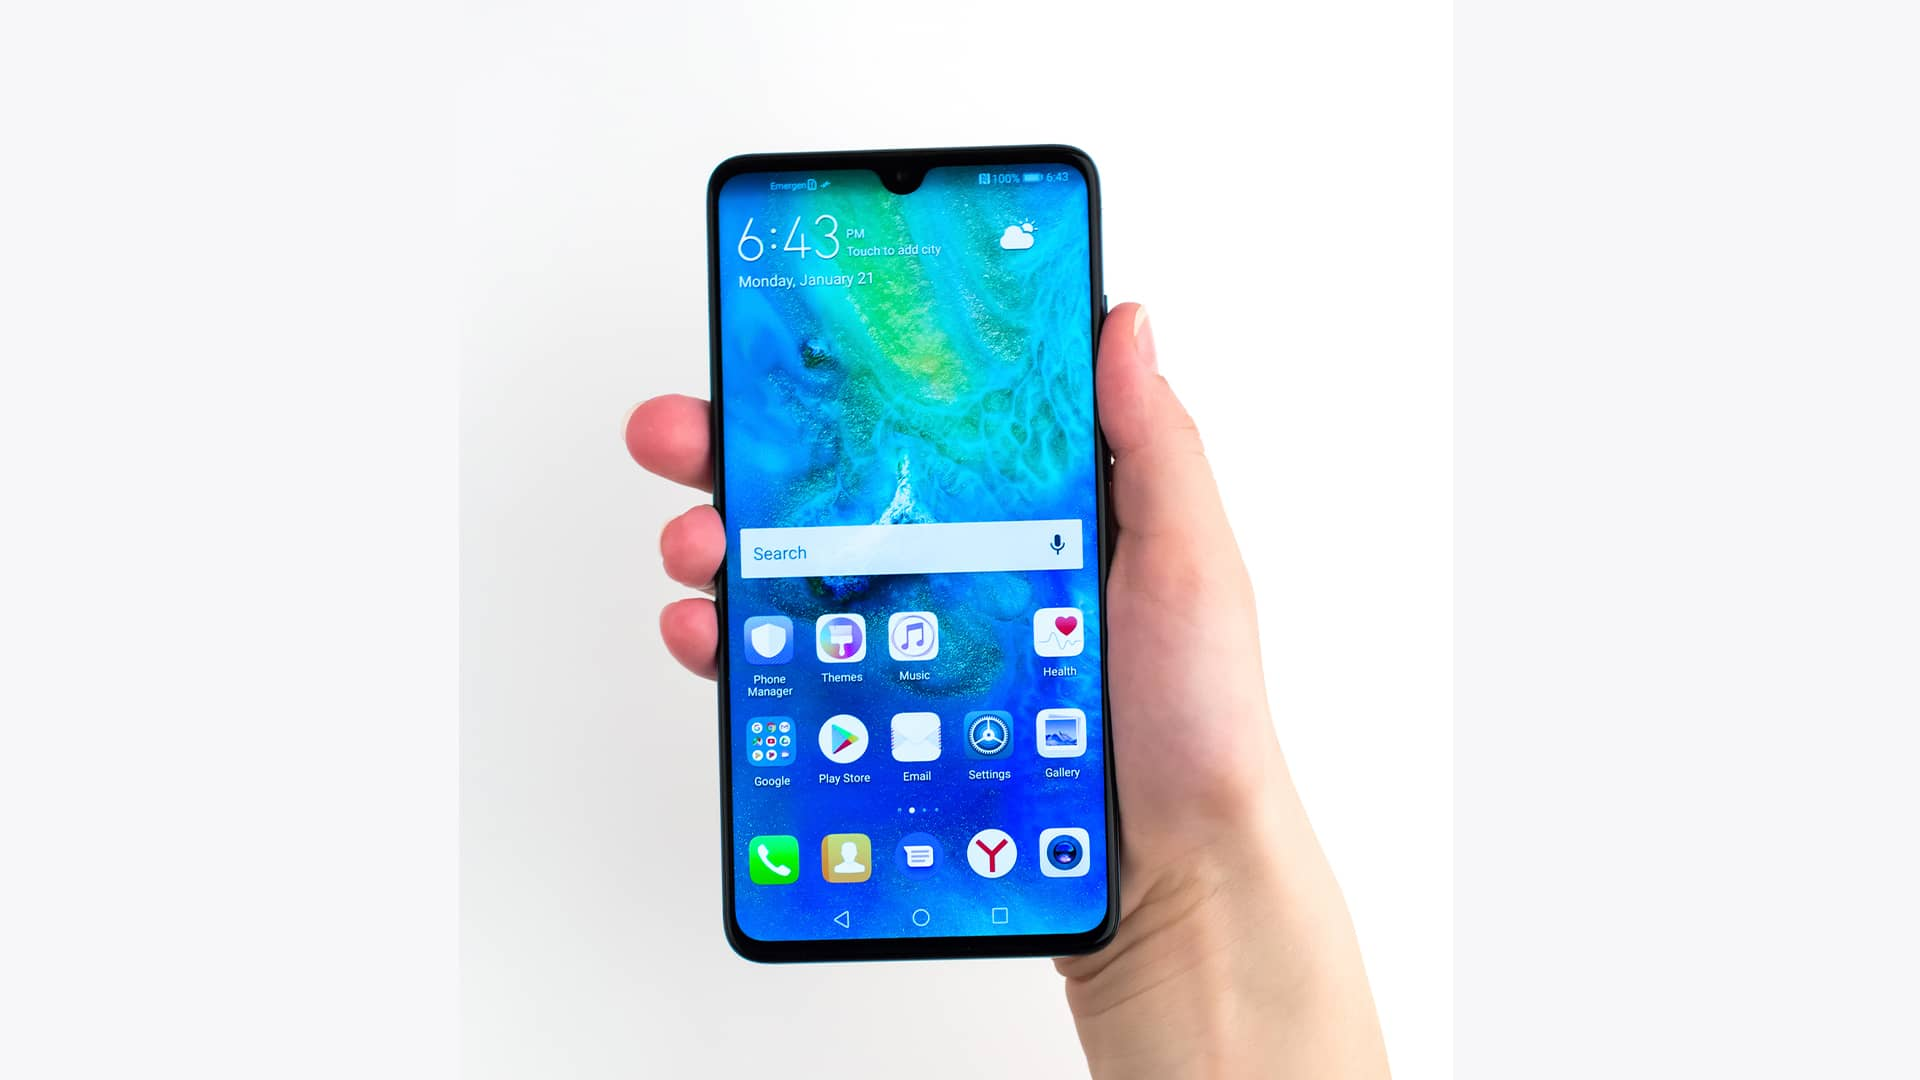 Huawei Mate 20 Vodafone: alternativas a este modelo